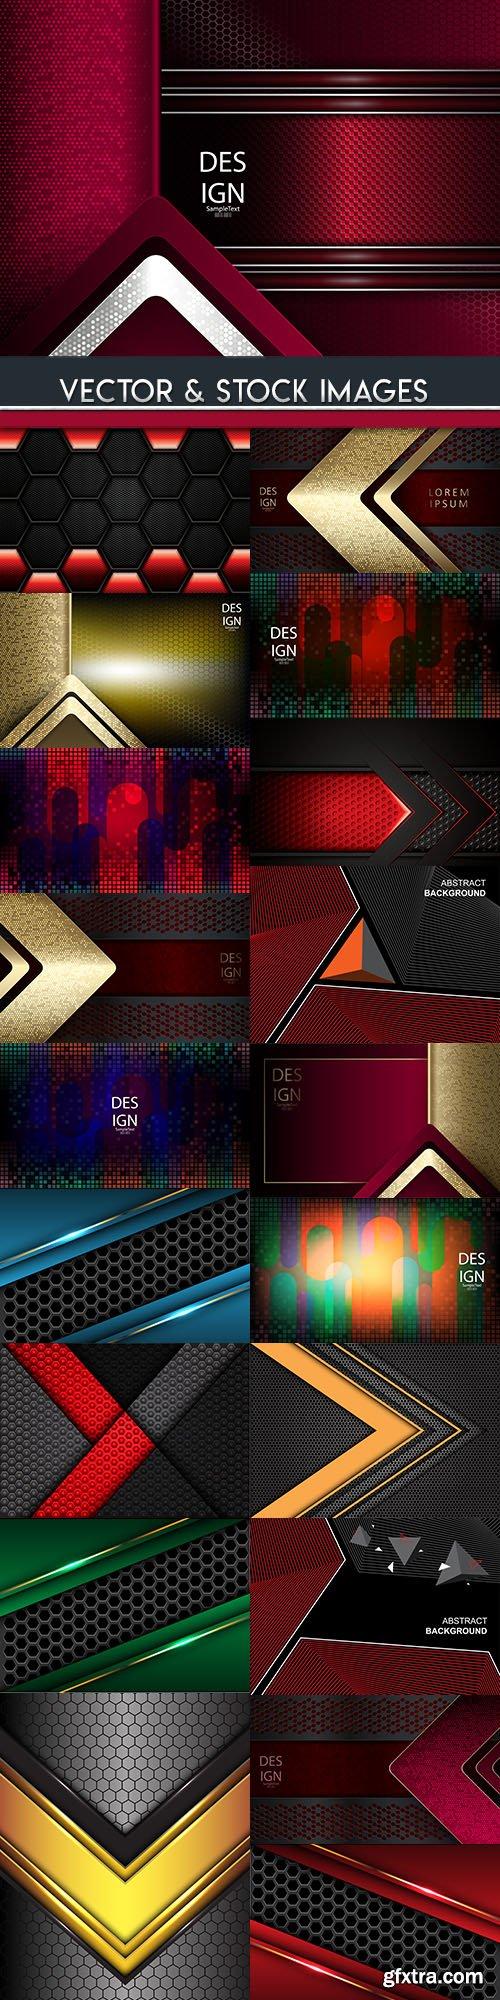 Elegant metallic and geometrical black background